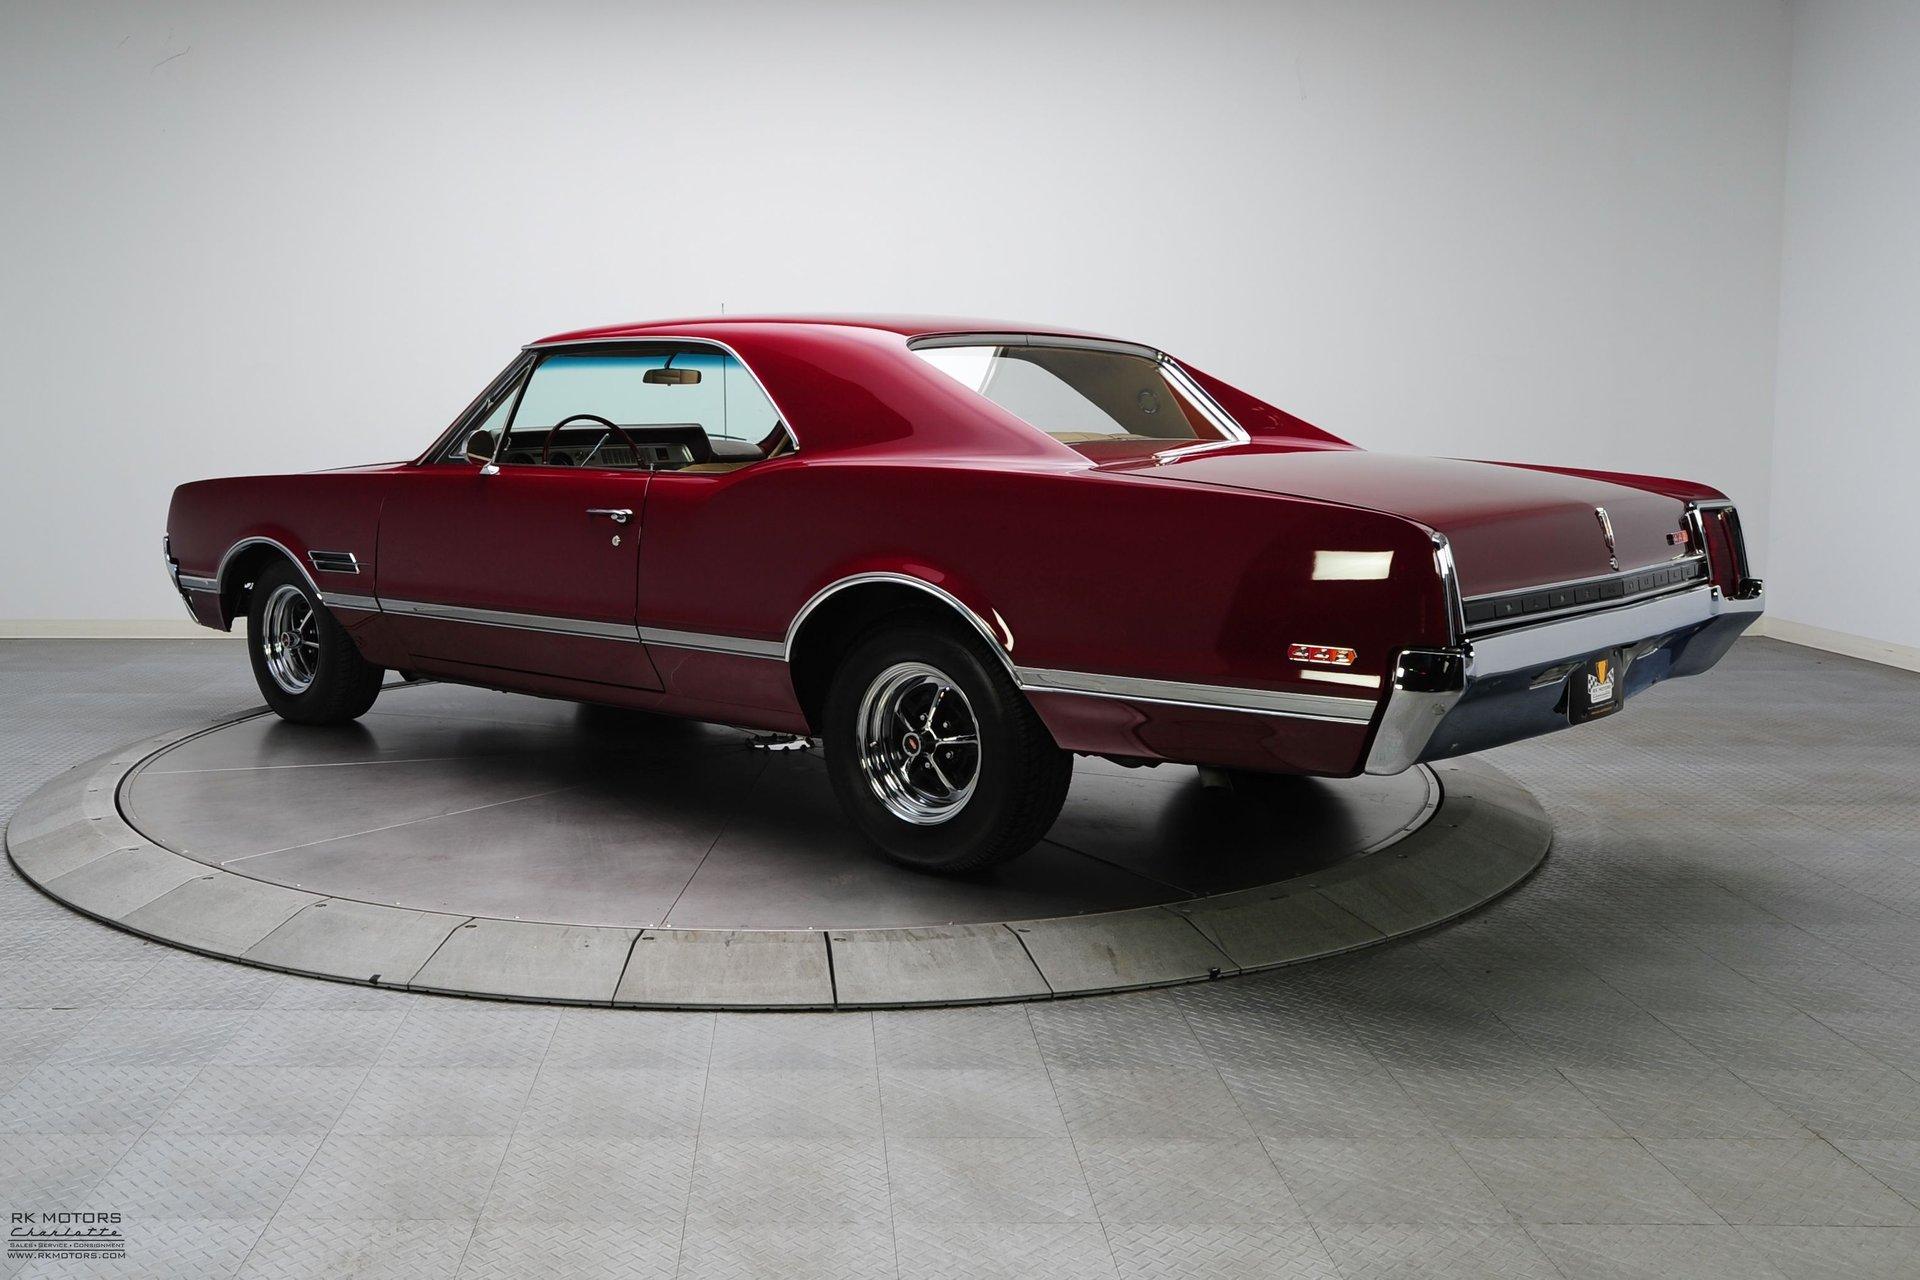 132930 1966 Oldsmobile Cutlass RK Motors Classic Cars for Sale